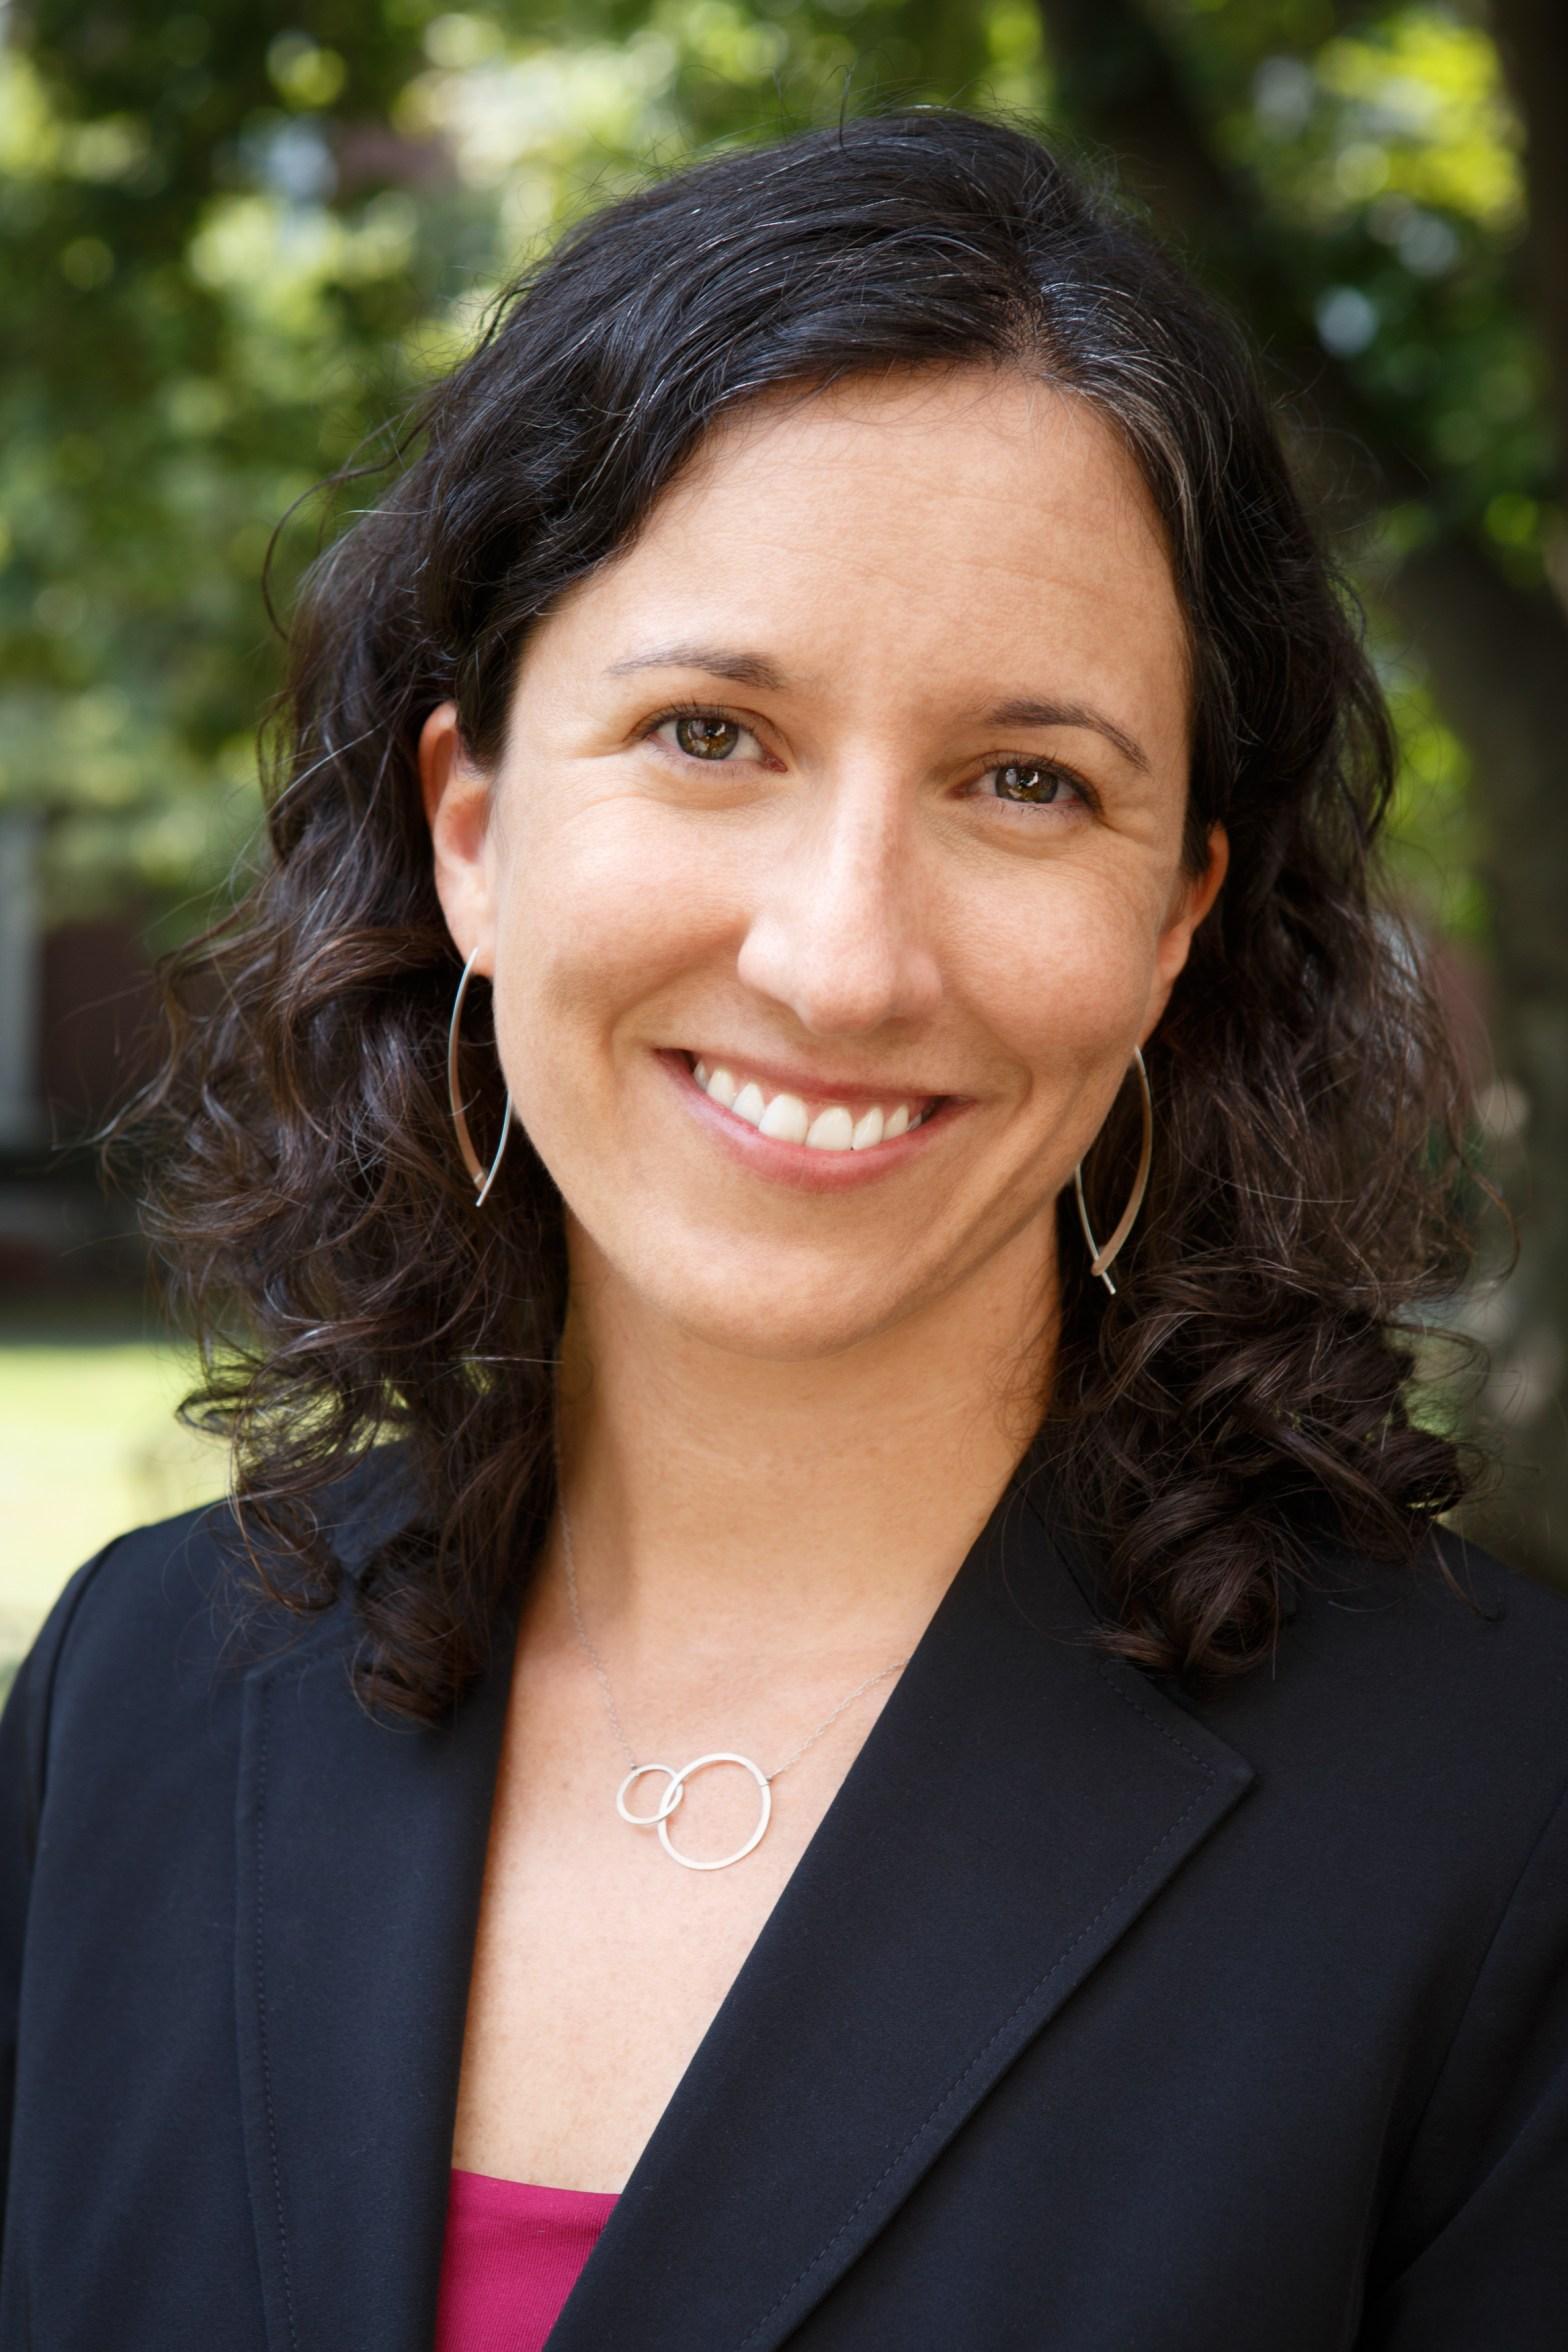 Dr. Ryann Manning, Assistant Professor